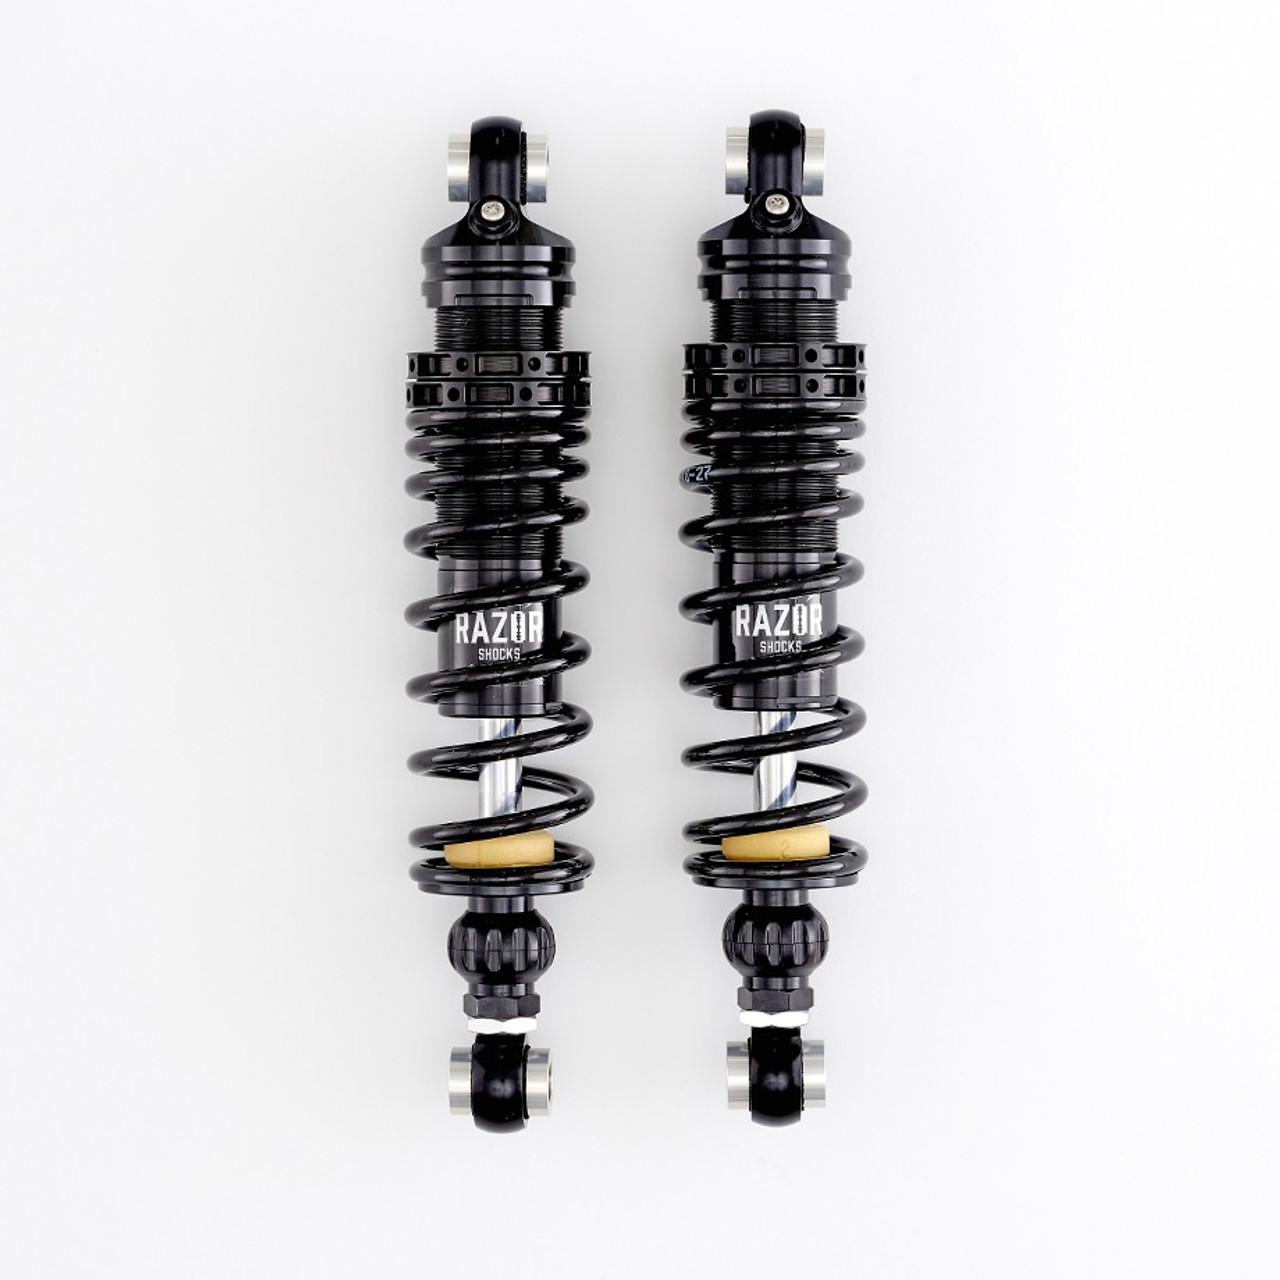 K-Tech Razor Lite III Emulsion Triumph Thruxton 1200 16-17 390mm +3/-7mm 283B-250-390-THR